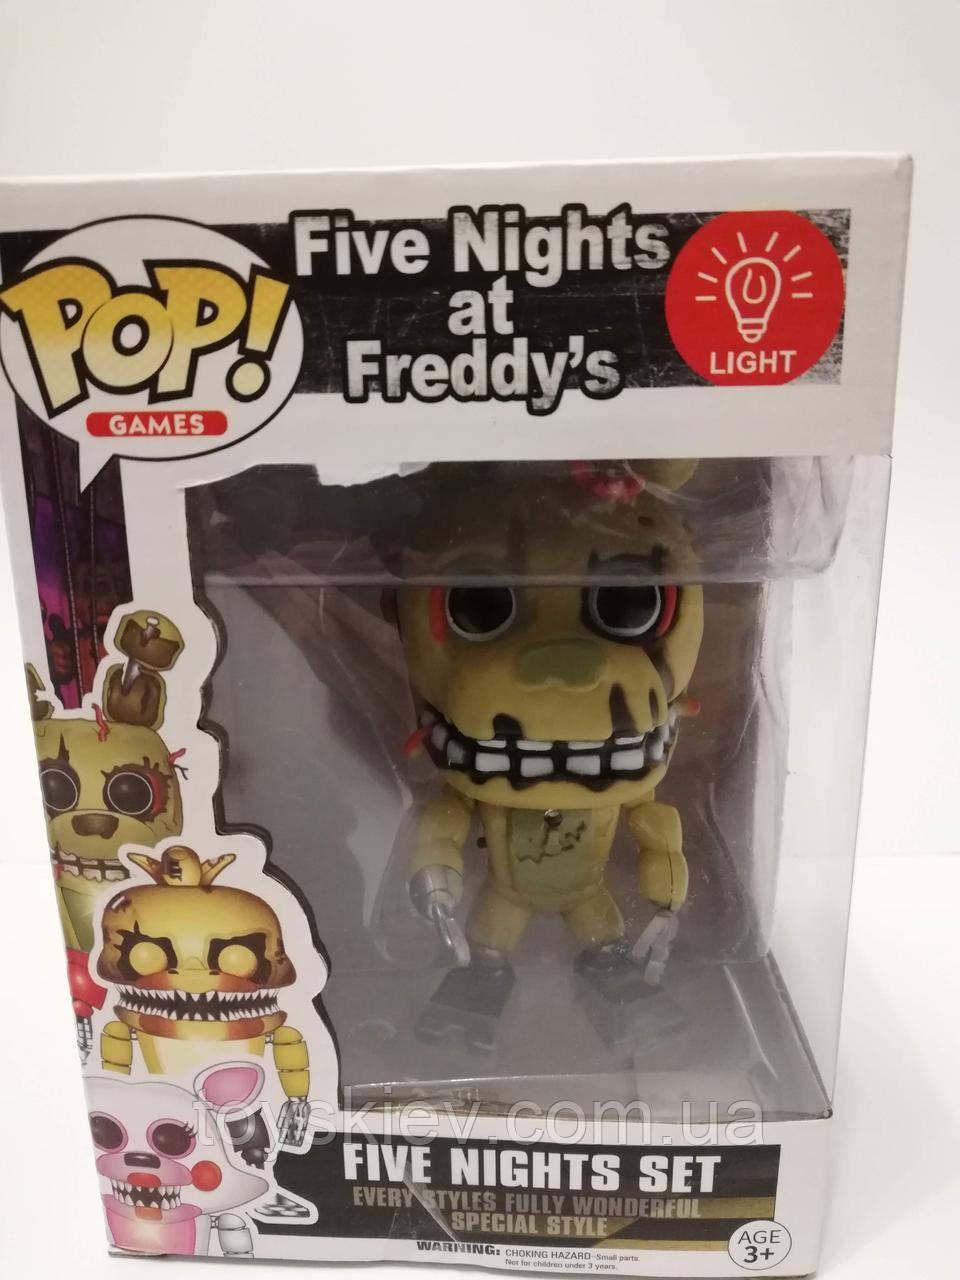 Игрушки 5 пять ночей с Фредди, Фредди / Funko Five Nights at Freddy's, Freddy 2011-2 свет эффекты.